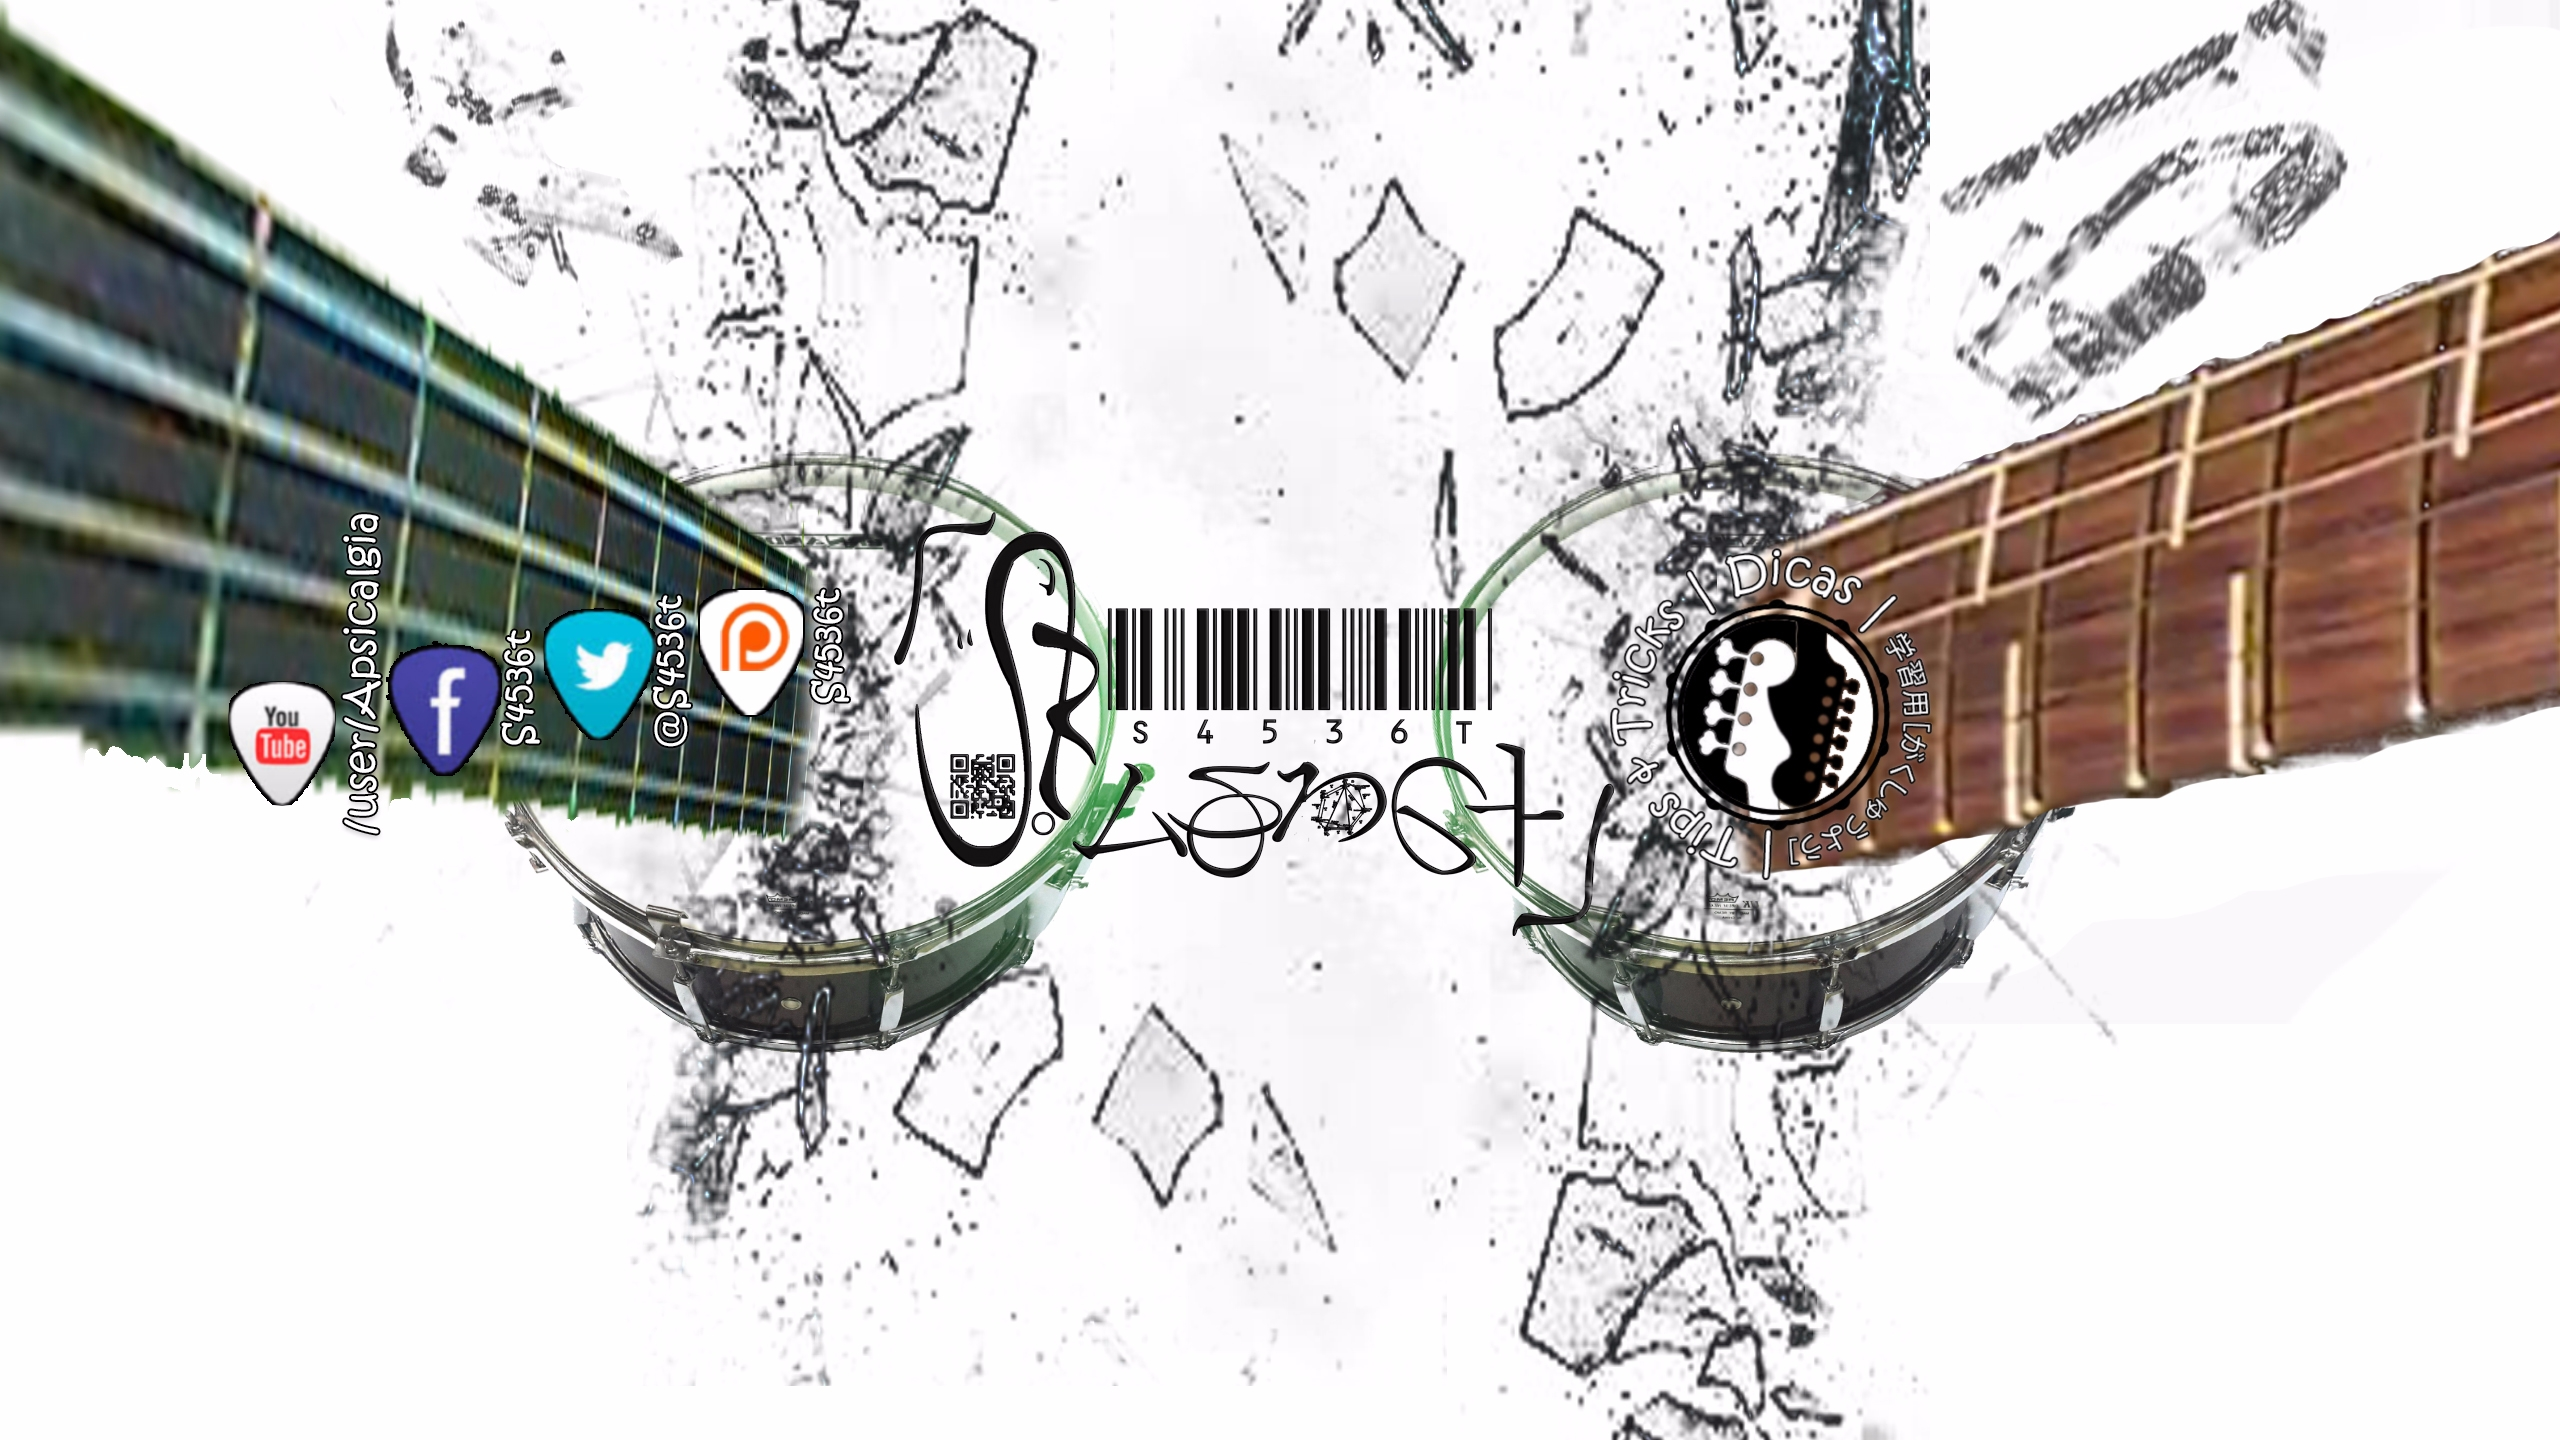 S4536t (@silentnote-s4536t) Cover Image